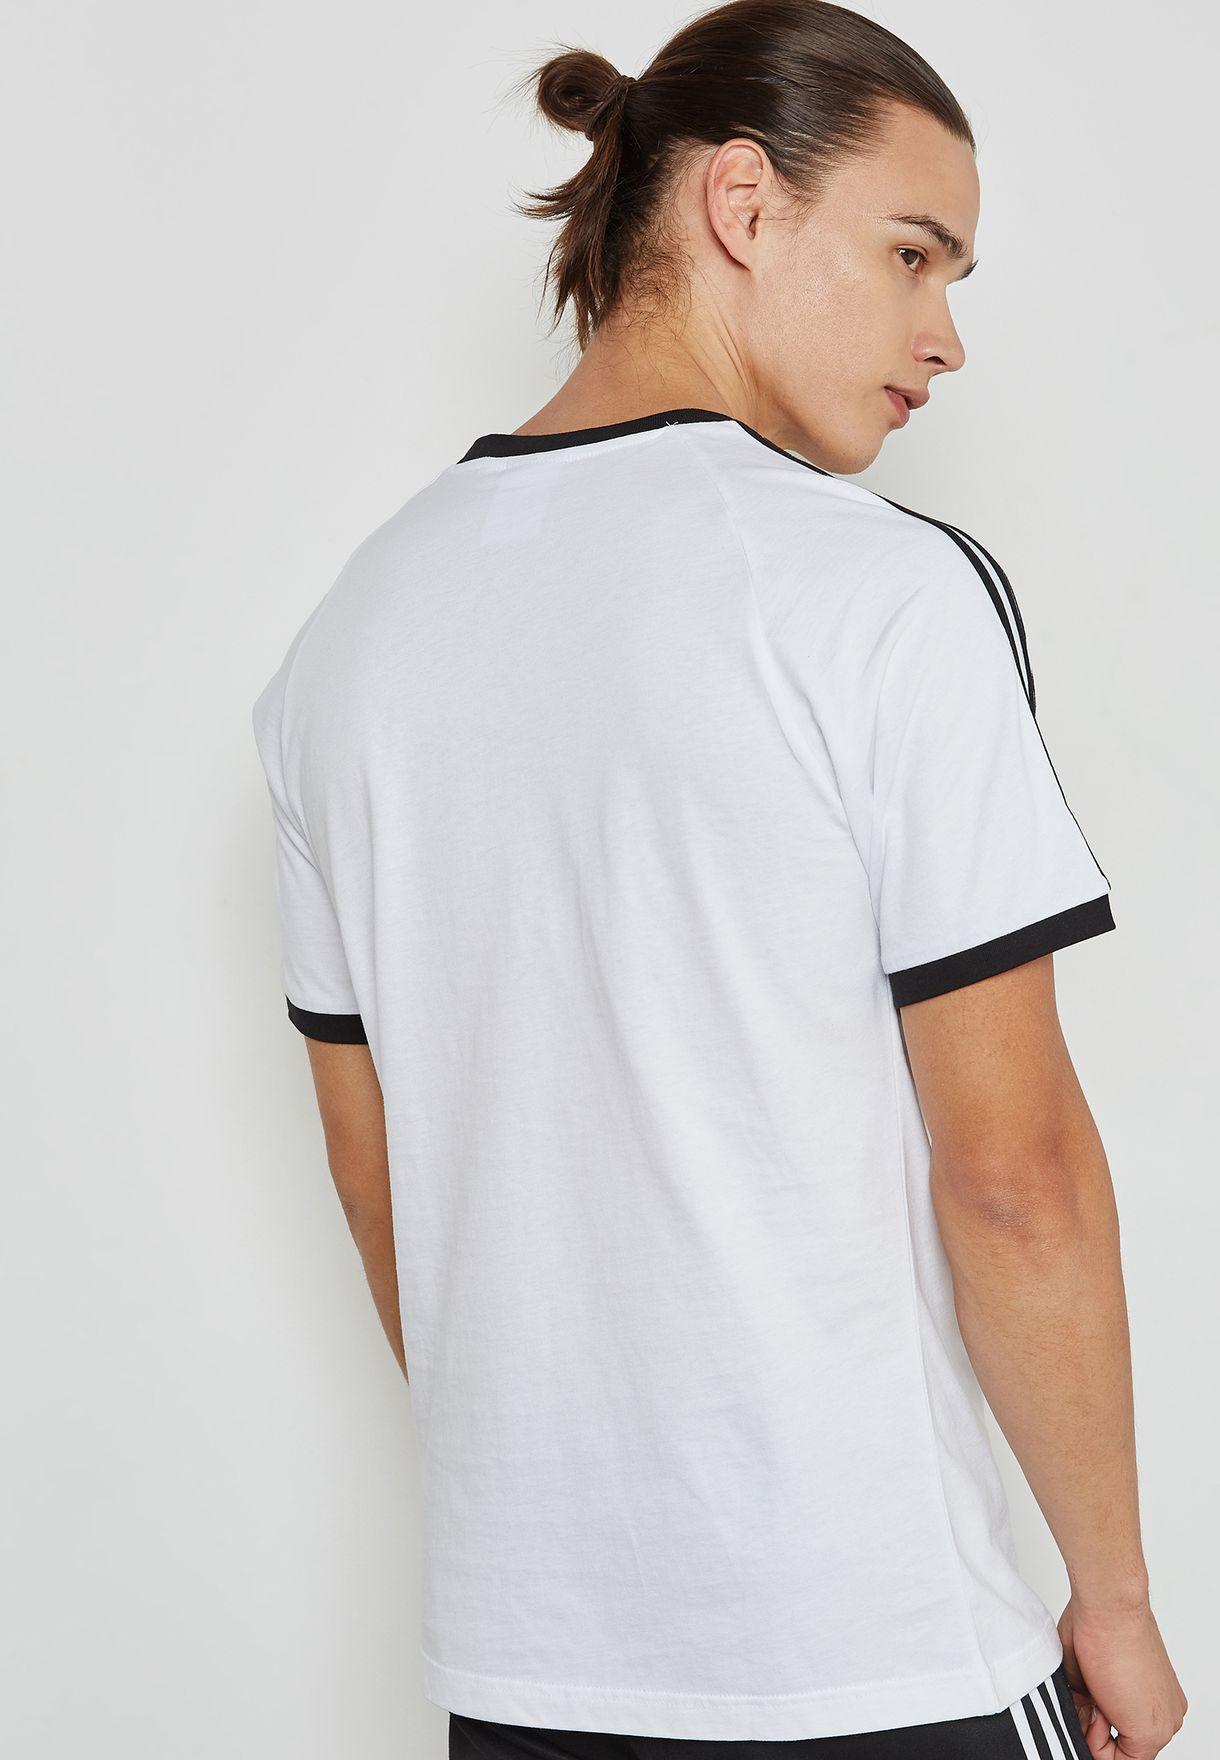 3 Stripes Adicolor Casual Men's T-Shirt